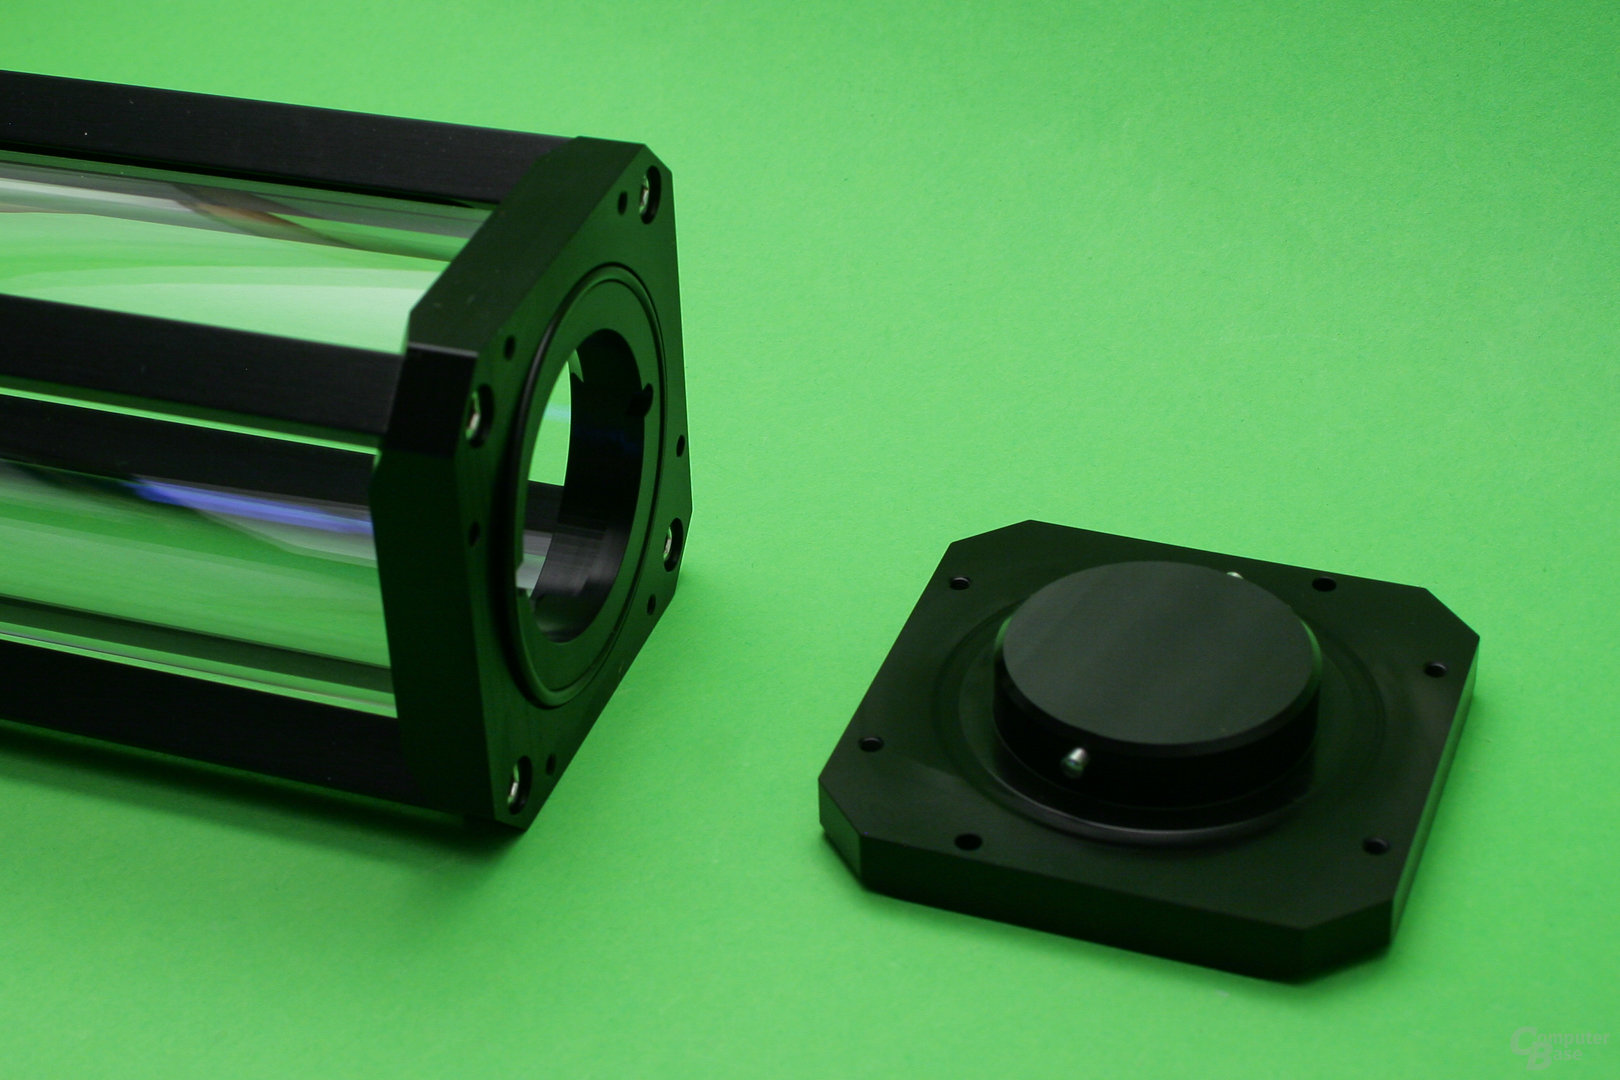 Watercool Heatkiller Tube D5: Deckel mit Bajonett-Verschluss